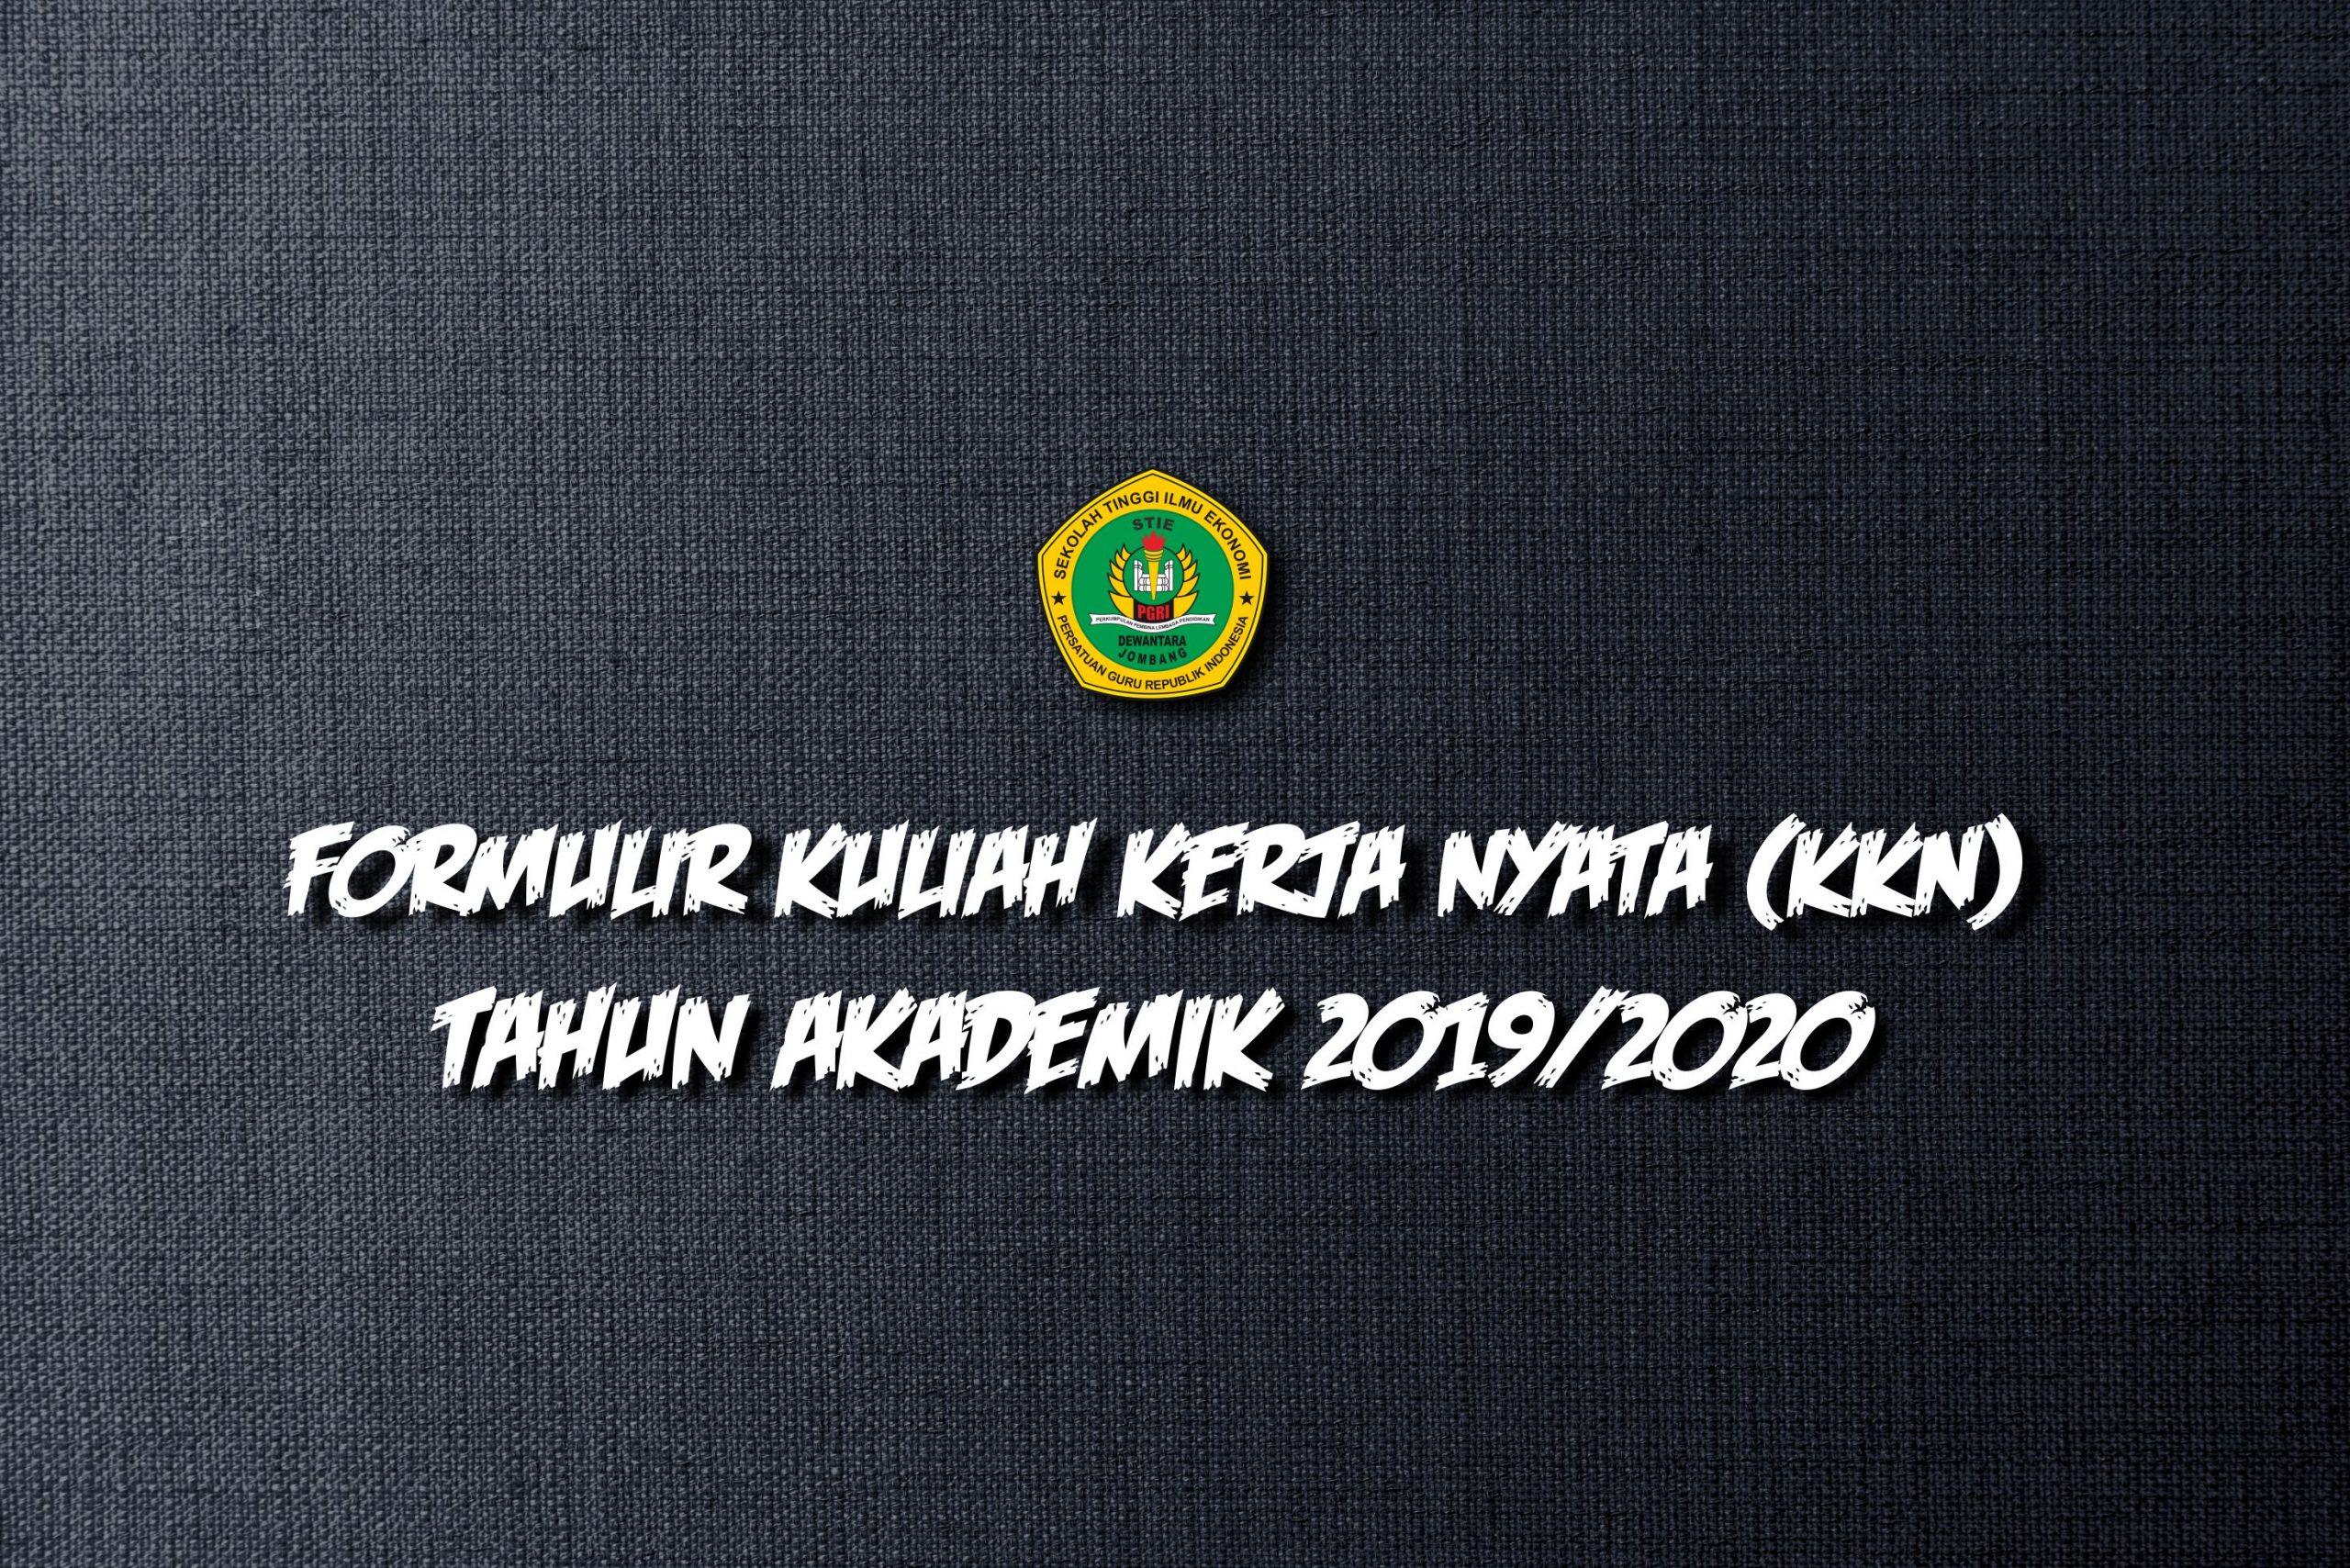 FORMULIR KULIAH KERJA NYATA (KKN) 2019